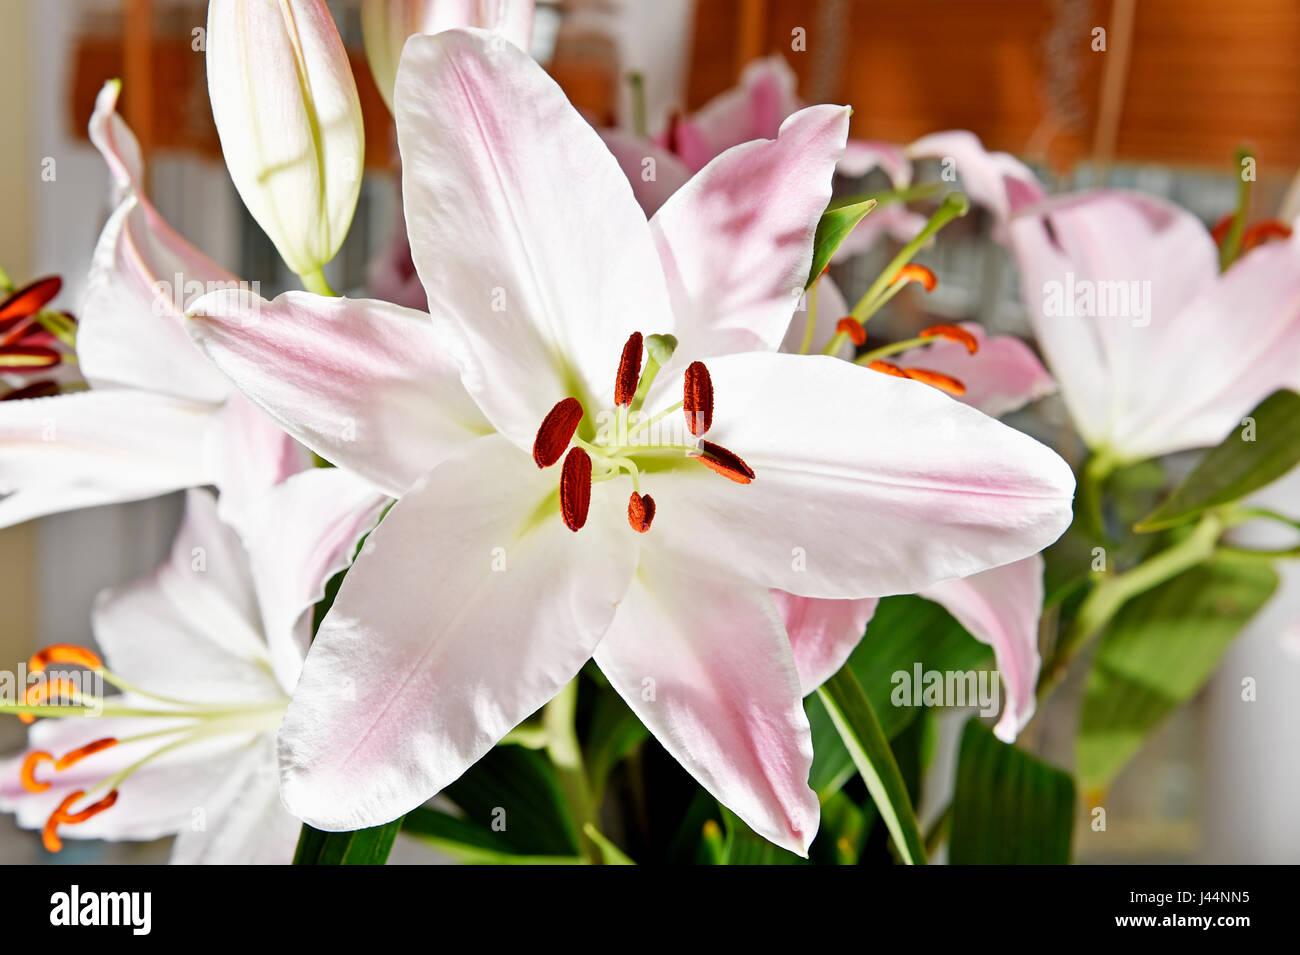 Pale Pink Oriental Lily Flower Stock Photo 140246433 Alamy